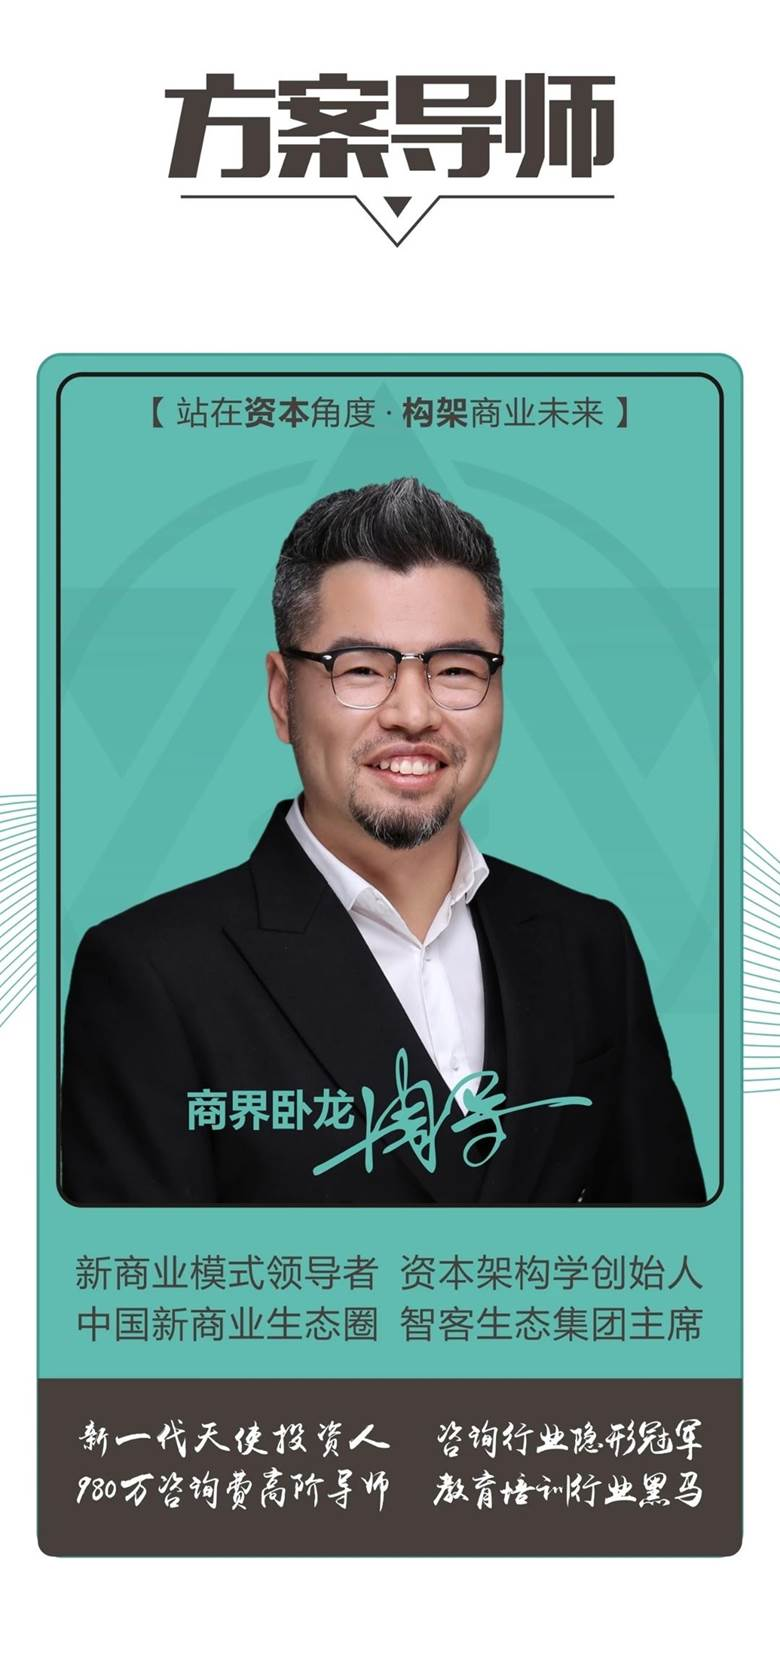 http://www.huodongxing.com/file/20191113/1063603644976/803660701280455.jpg